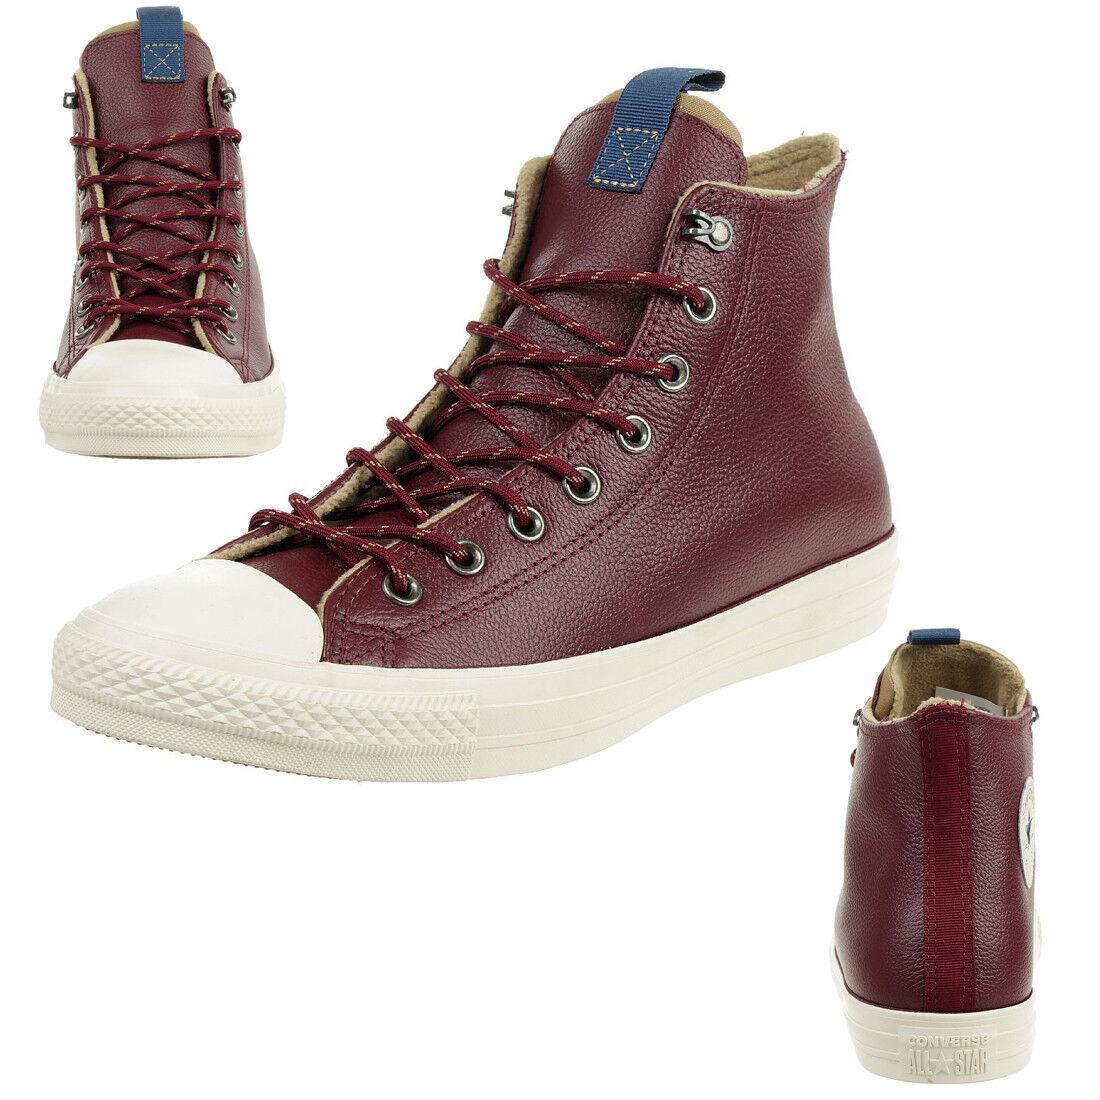 finest selection c2fd4 0af65 Adidas Originals Gazelle Messieurs-Sneaker Baskets Sneaker Chaussures De  Sport Chaussures,